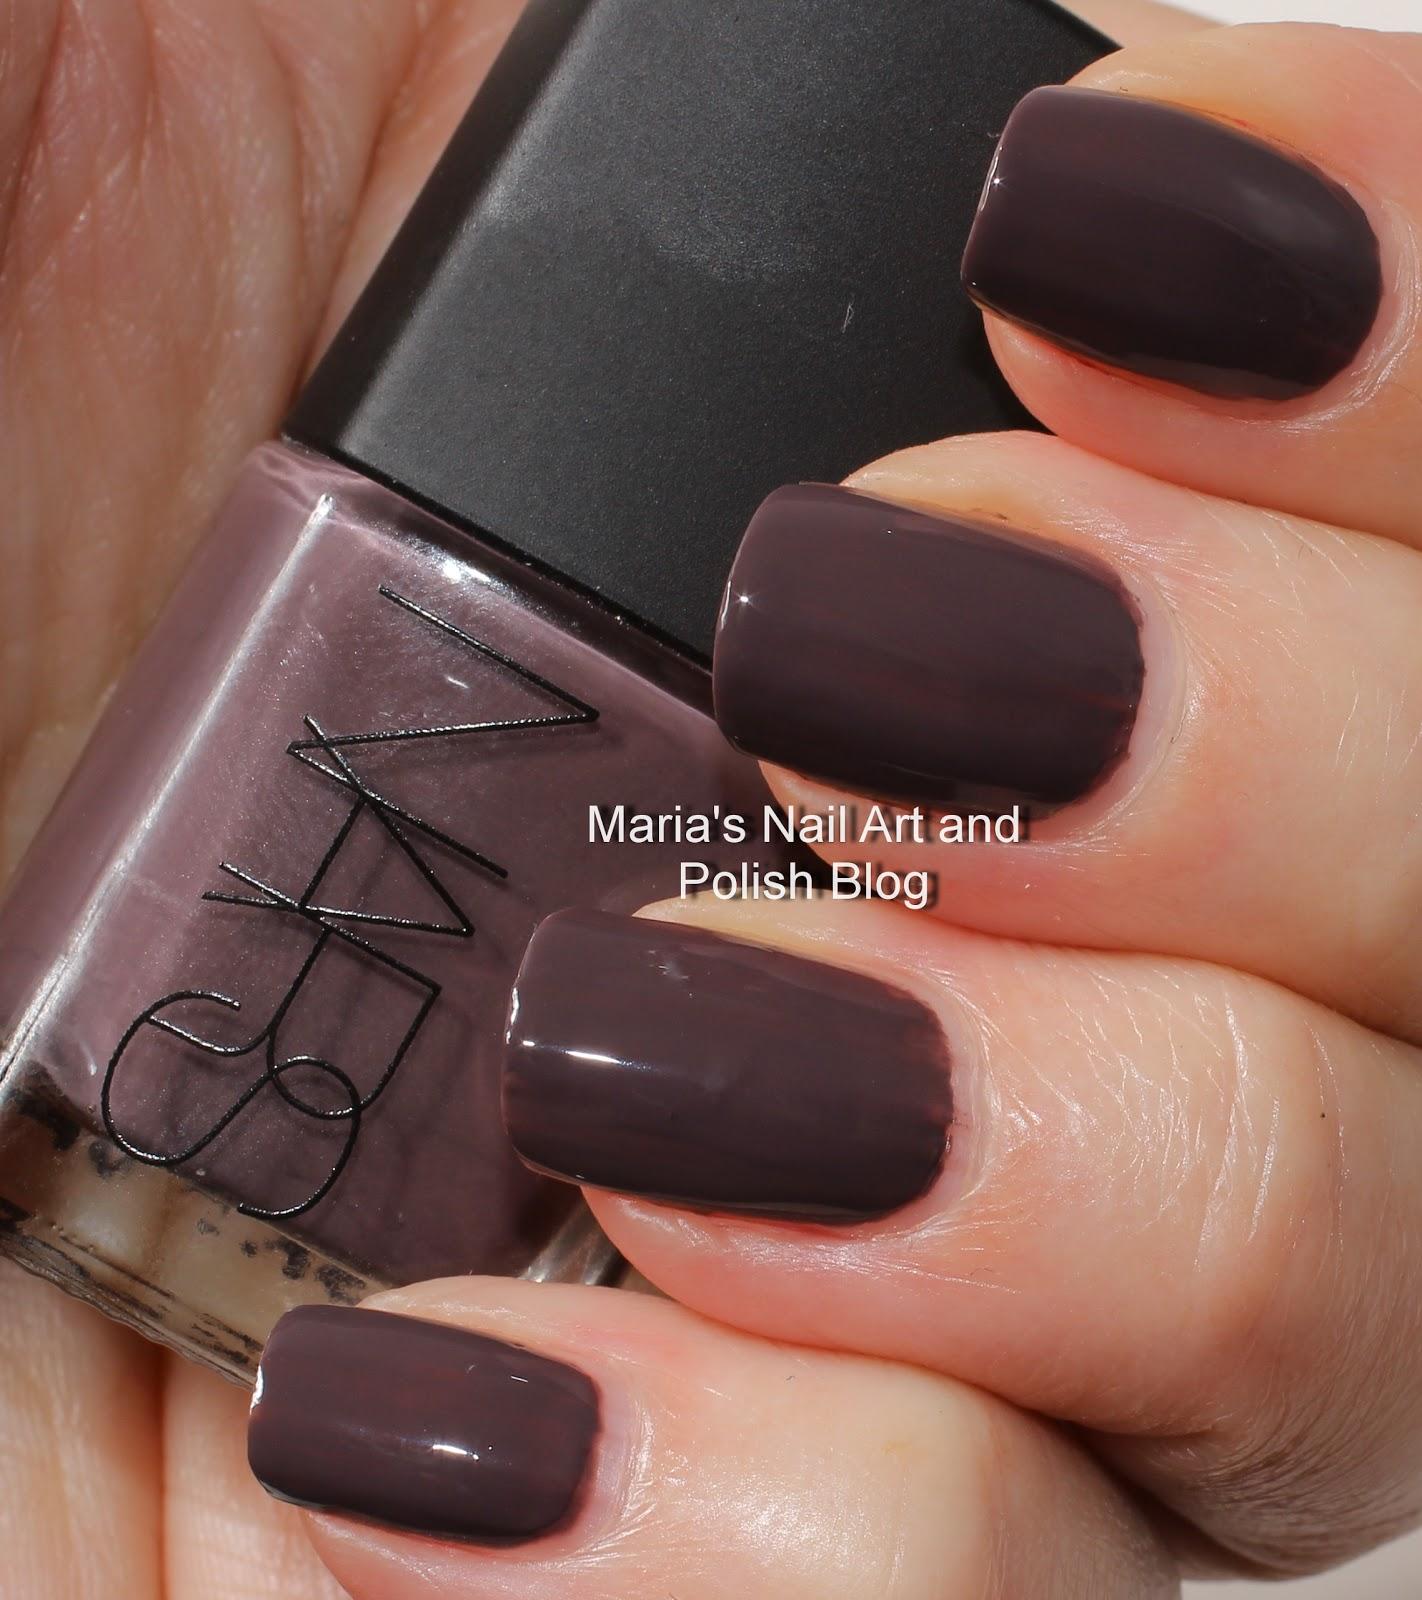 Marias Nail Art And Polish Blog Flushed With Stripes And: Marias Nail Art And Polish Blog: NARS Beautiful Stranger